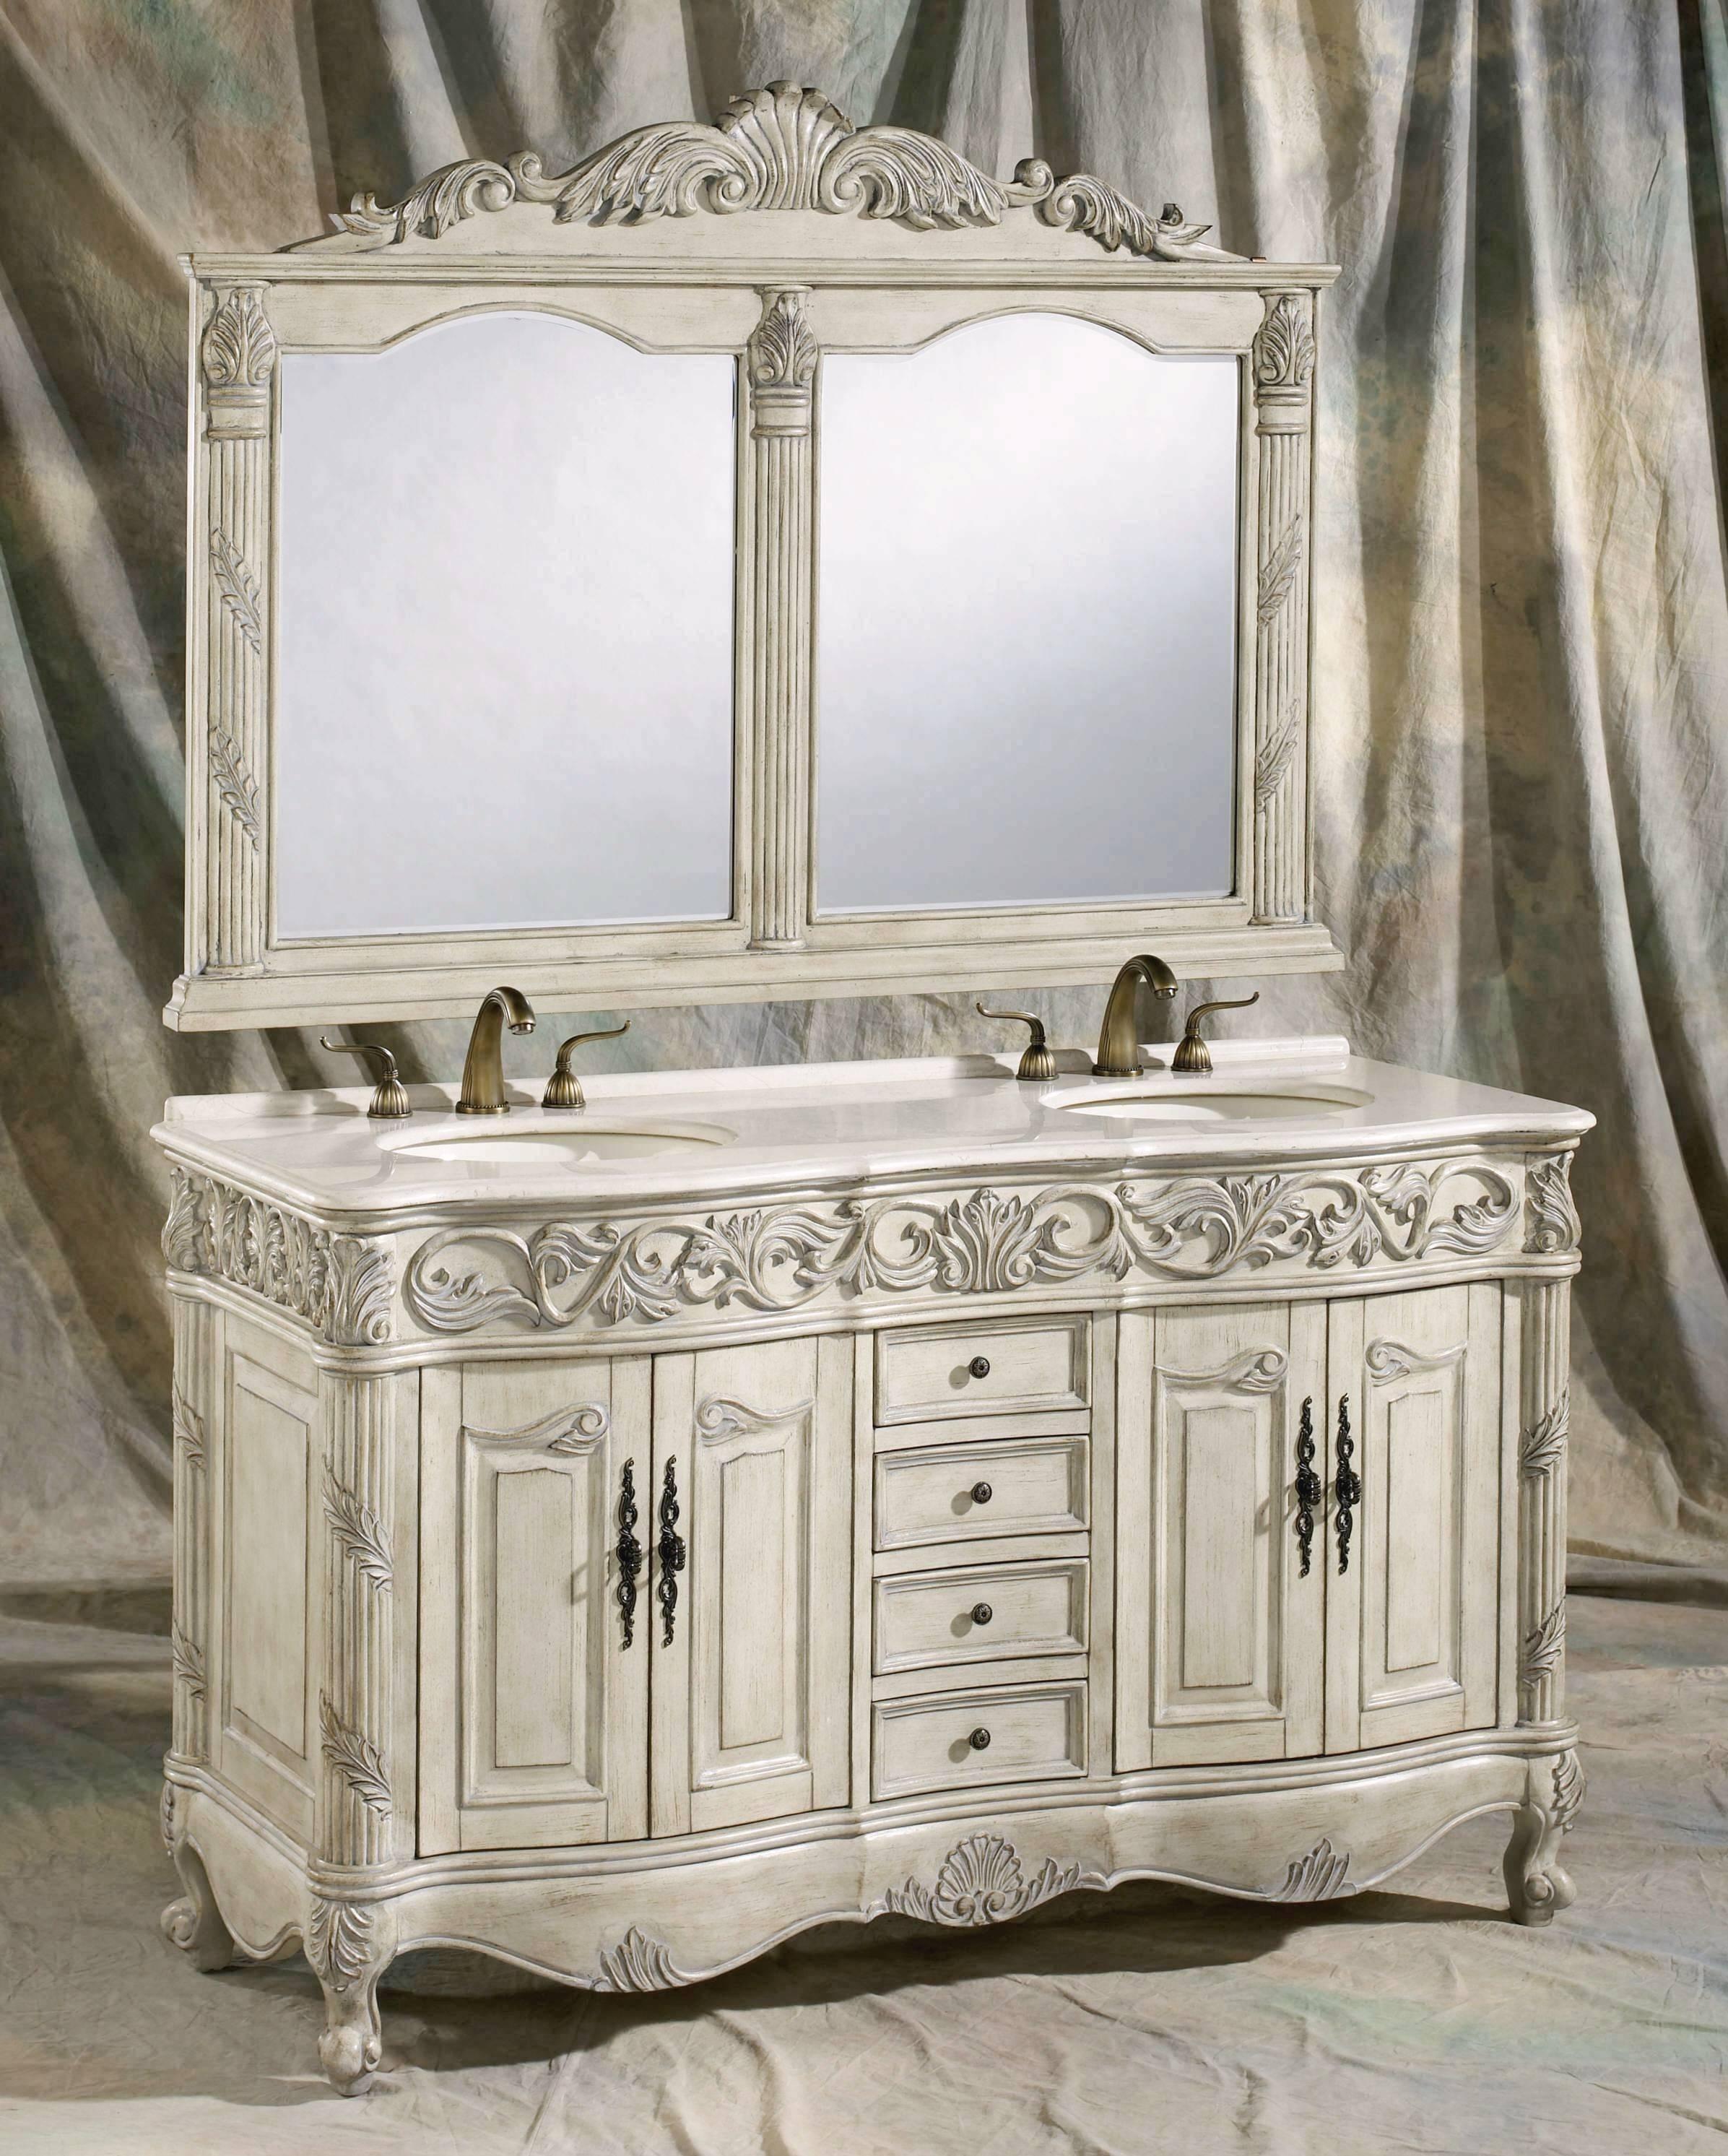 60 Inch Omaha Vanity Double Sink Vanity Vanity With Mirror